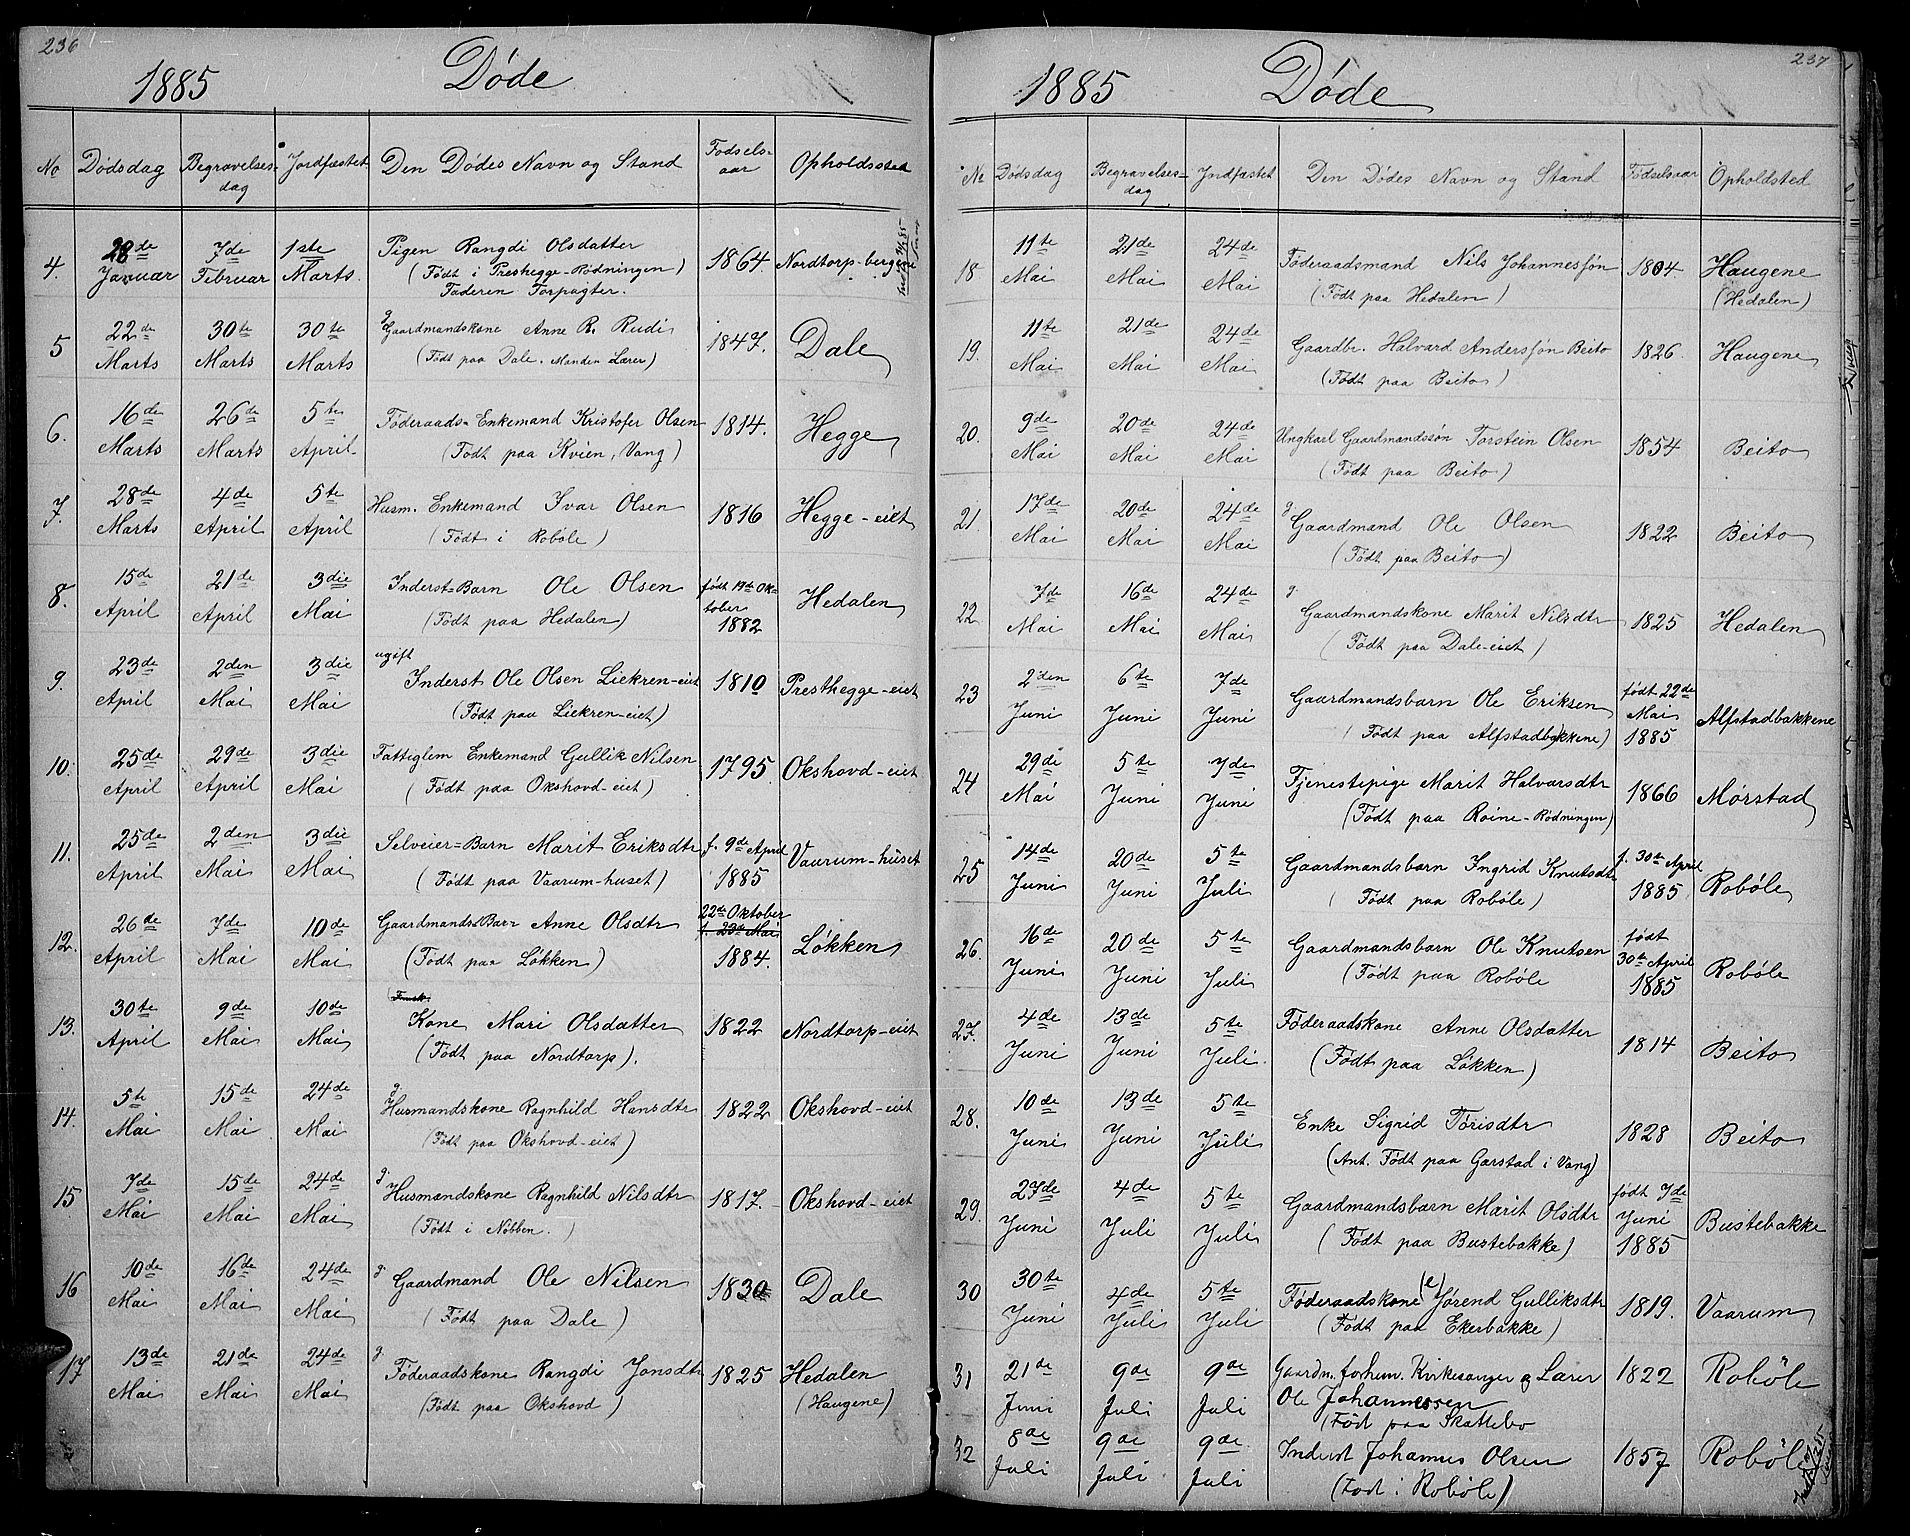 SAH, Øystre Slidre prestekontor, Klokkerbok nr. 1, 1866-1886, s. 236-237